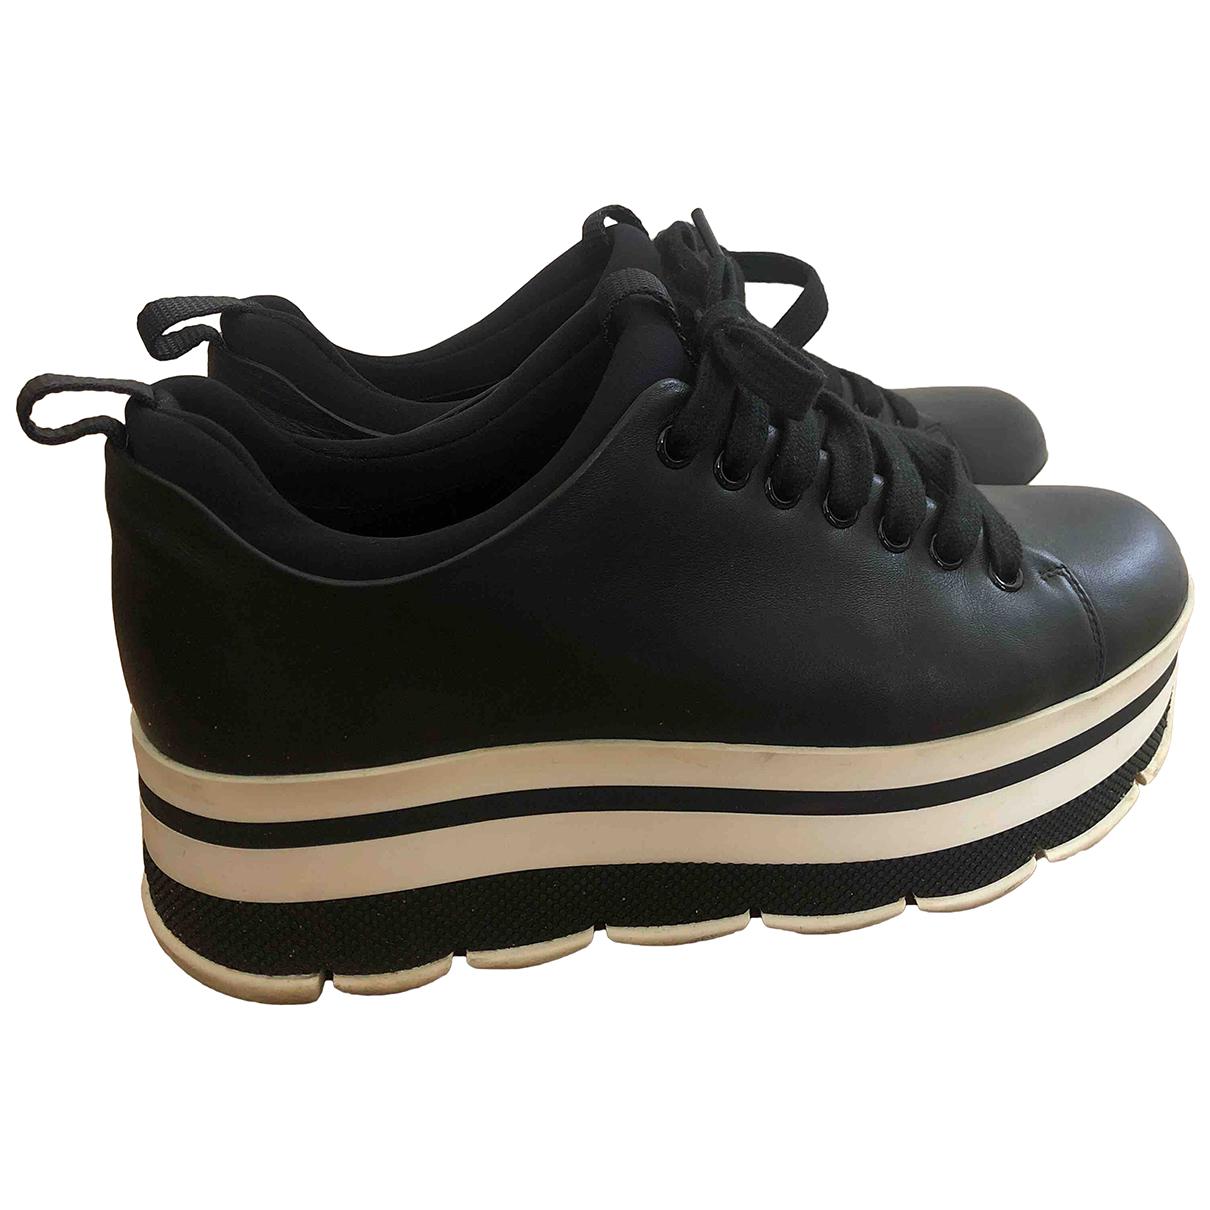 Prada \N Black Leather Lace ups for Women 39 EU